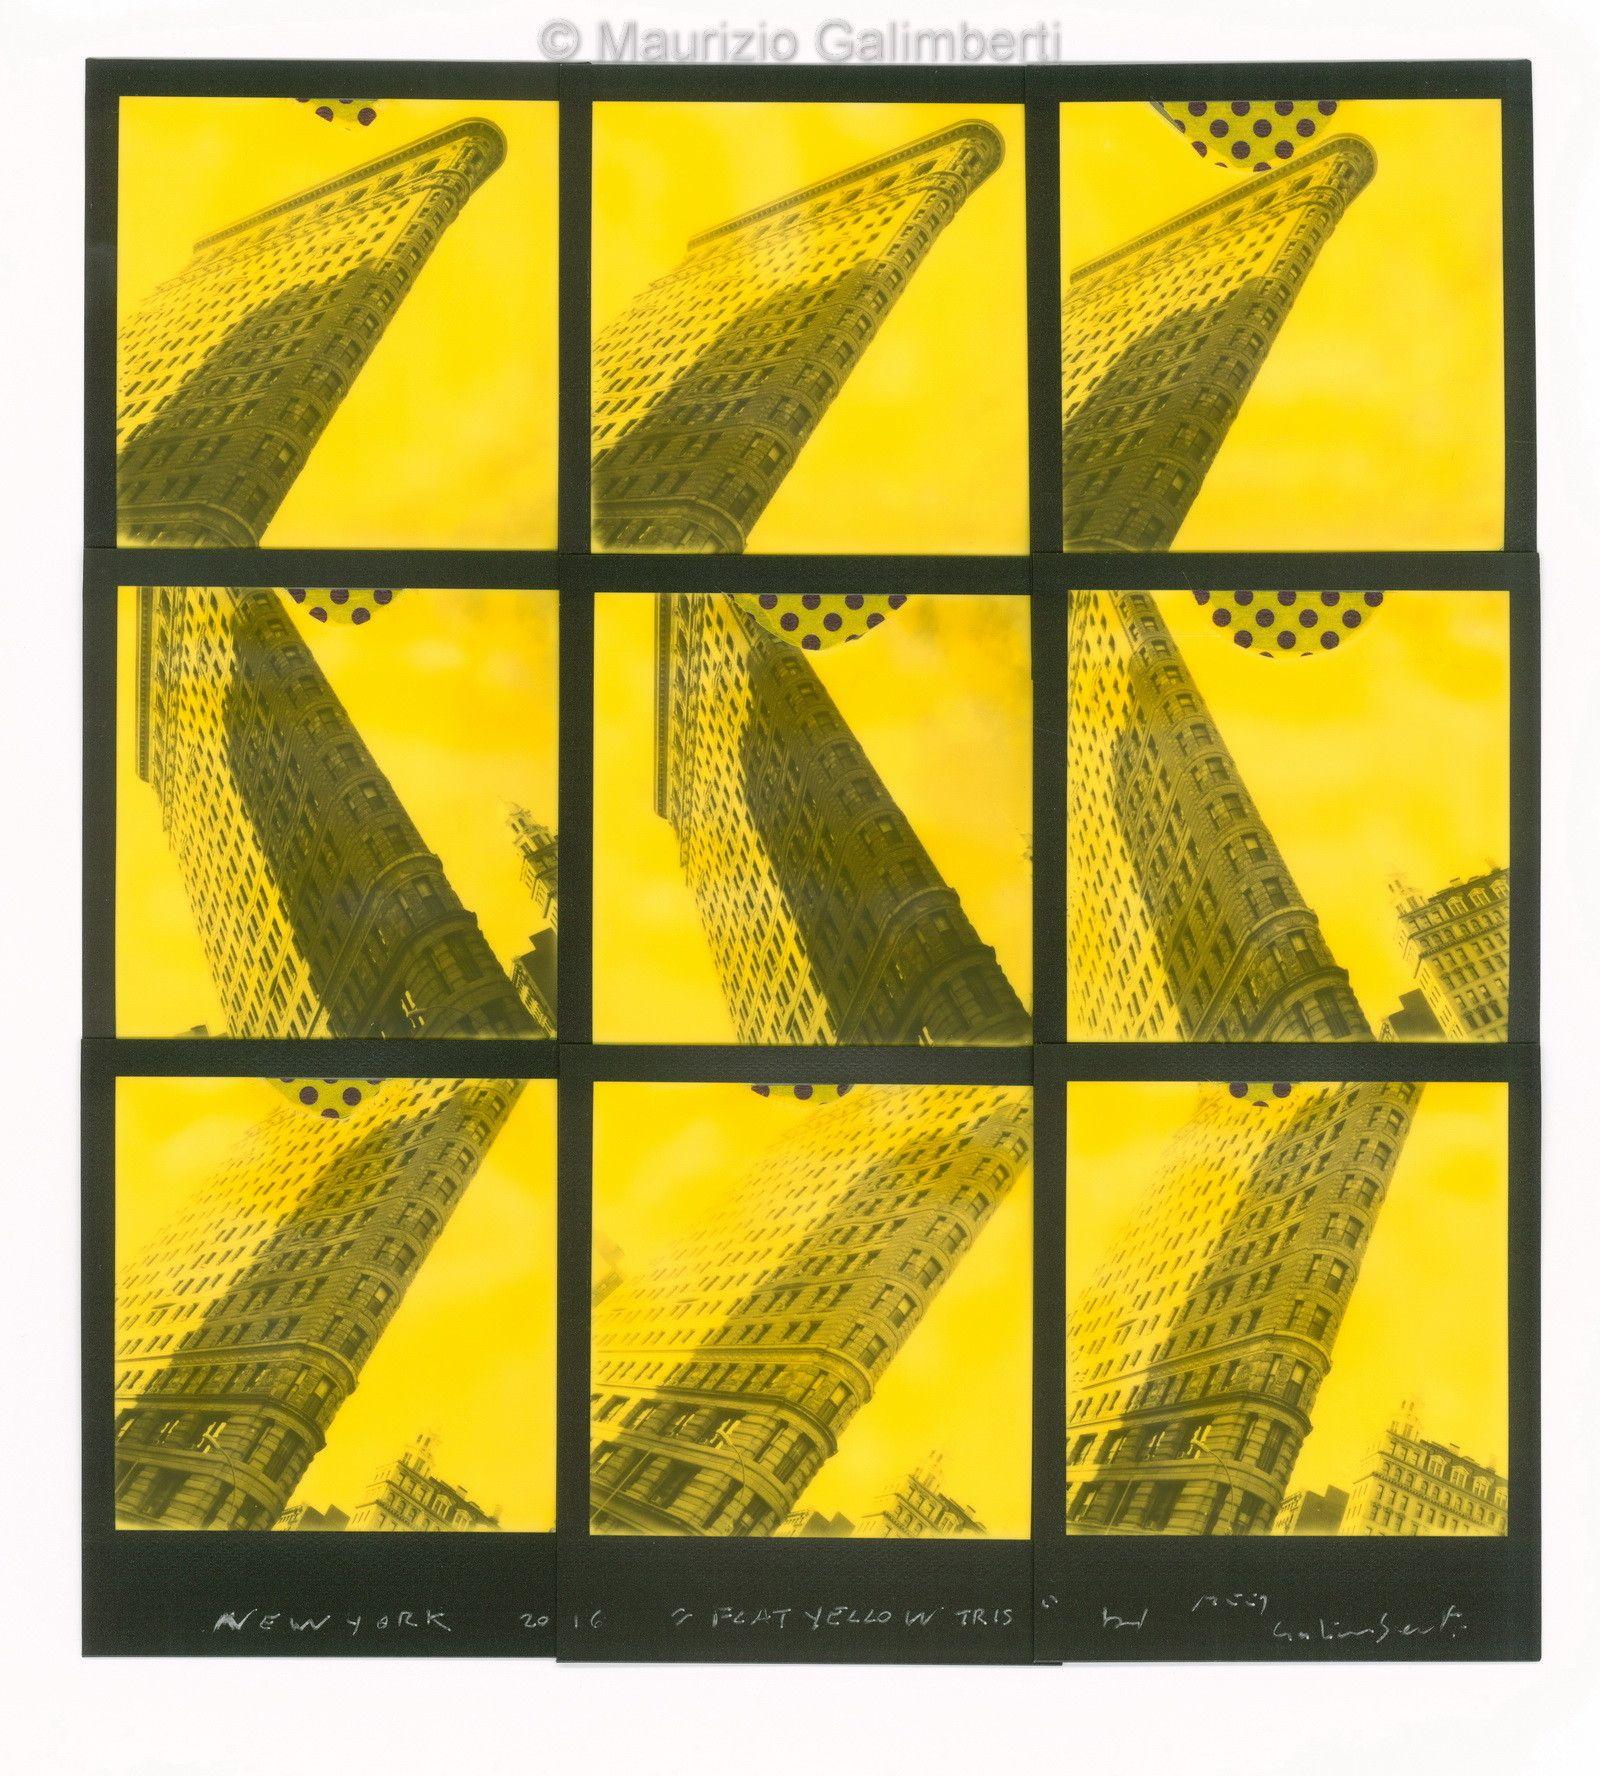 VINTAGE POLAROID MAURIZIO GALIMBERTI 'FLAT YELLOW TRIS' dimensioni cm. 49x52